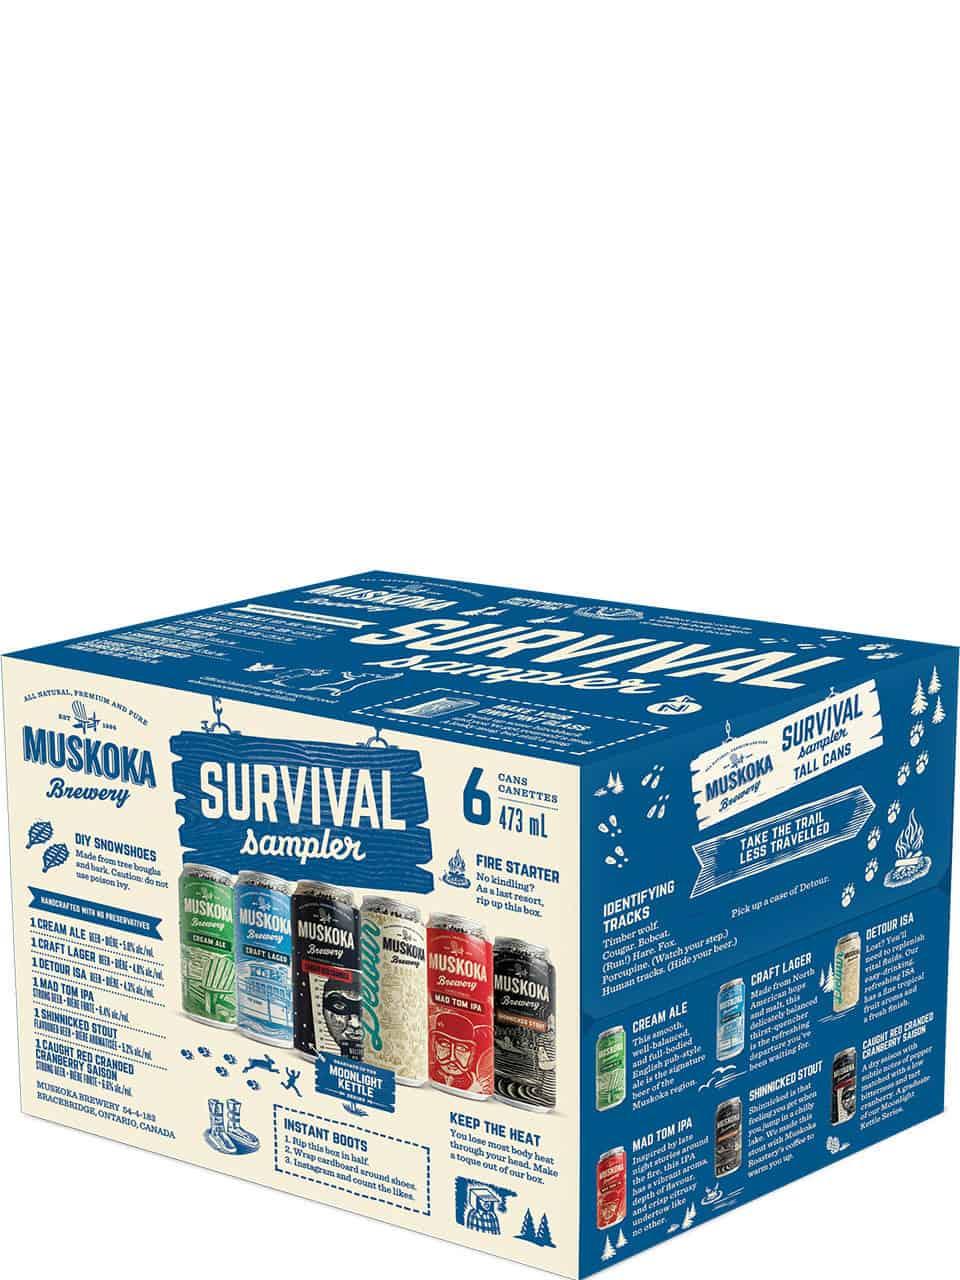 Muskoka Winter Survival Sampler 6 Pack Cans